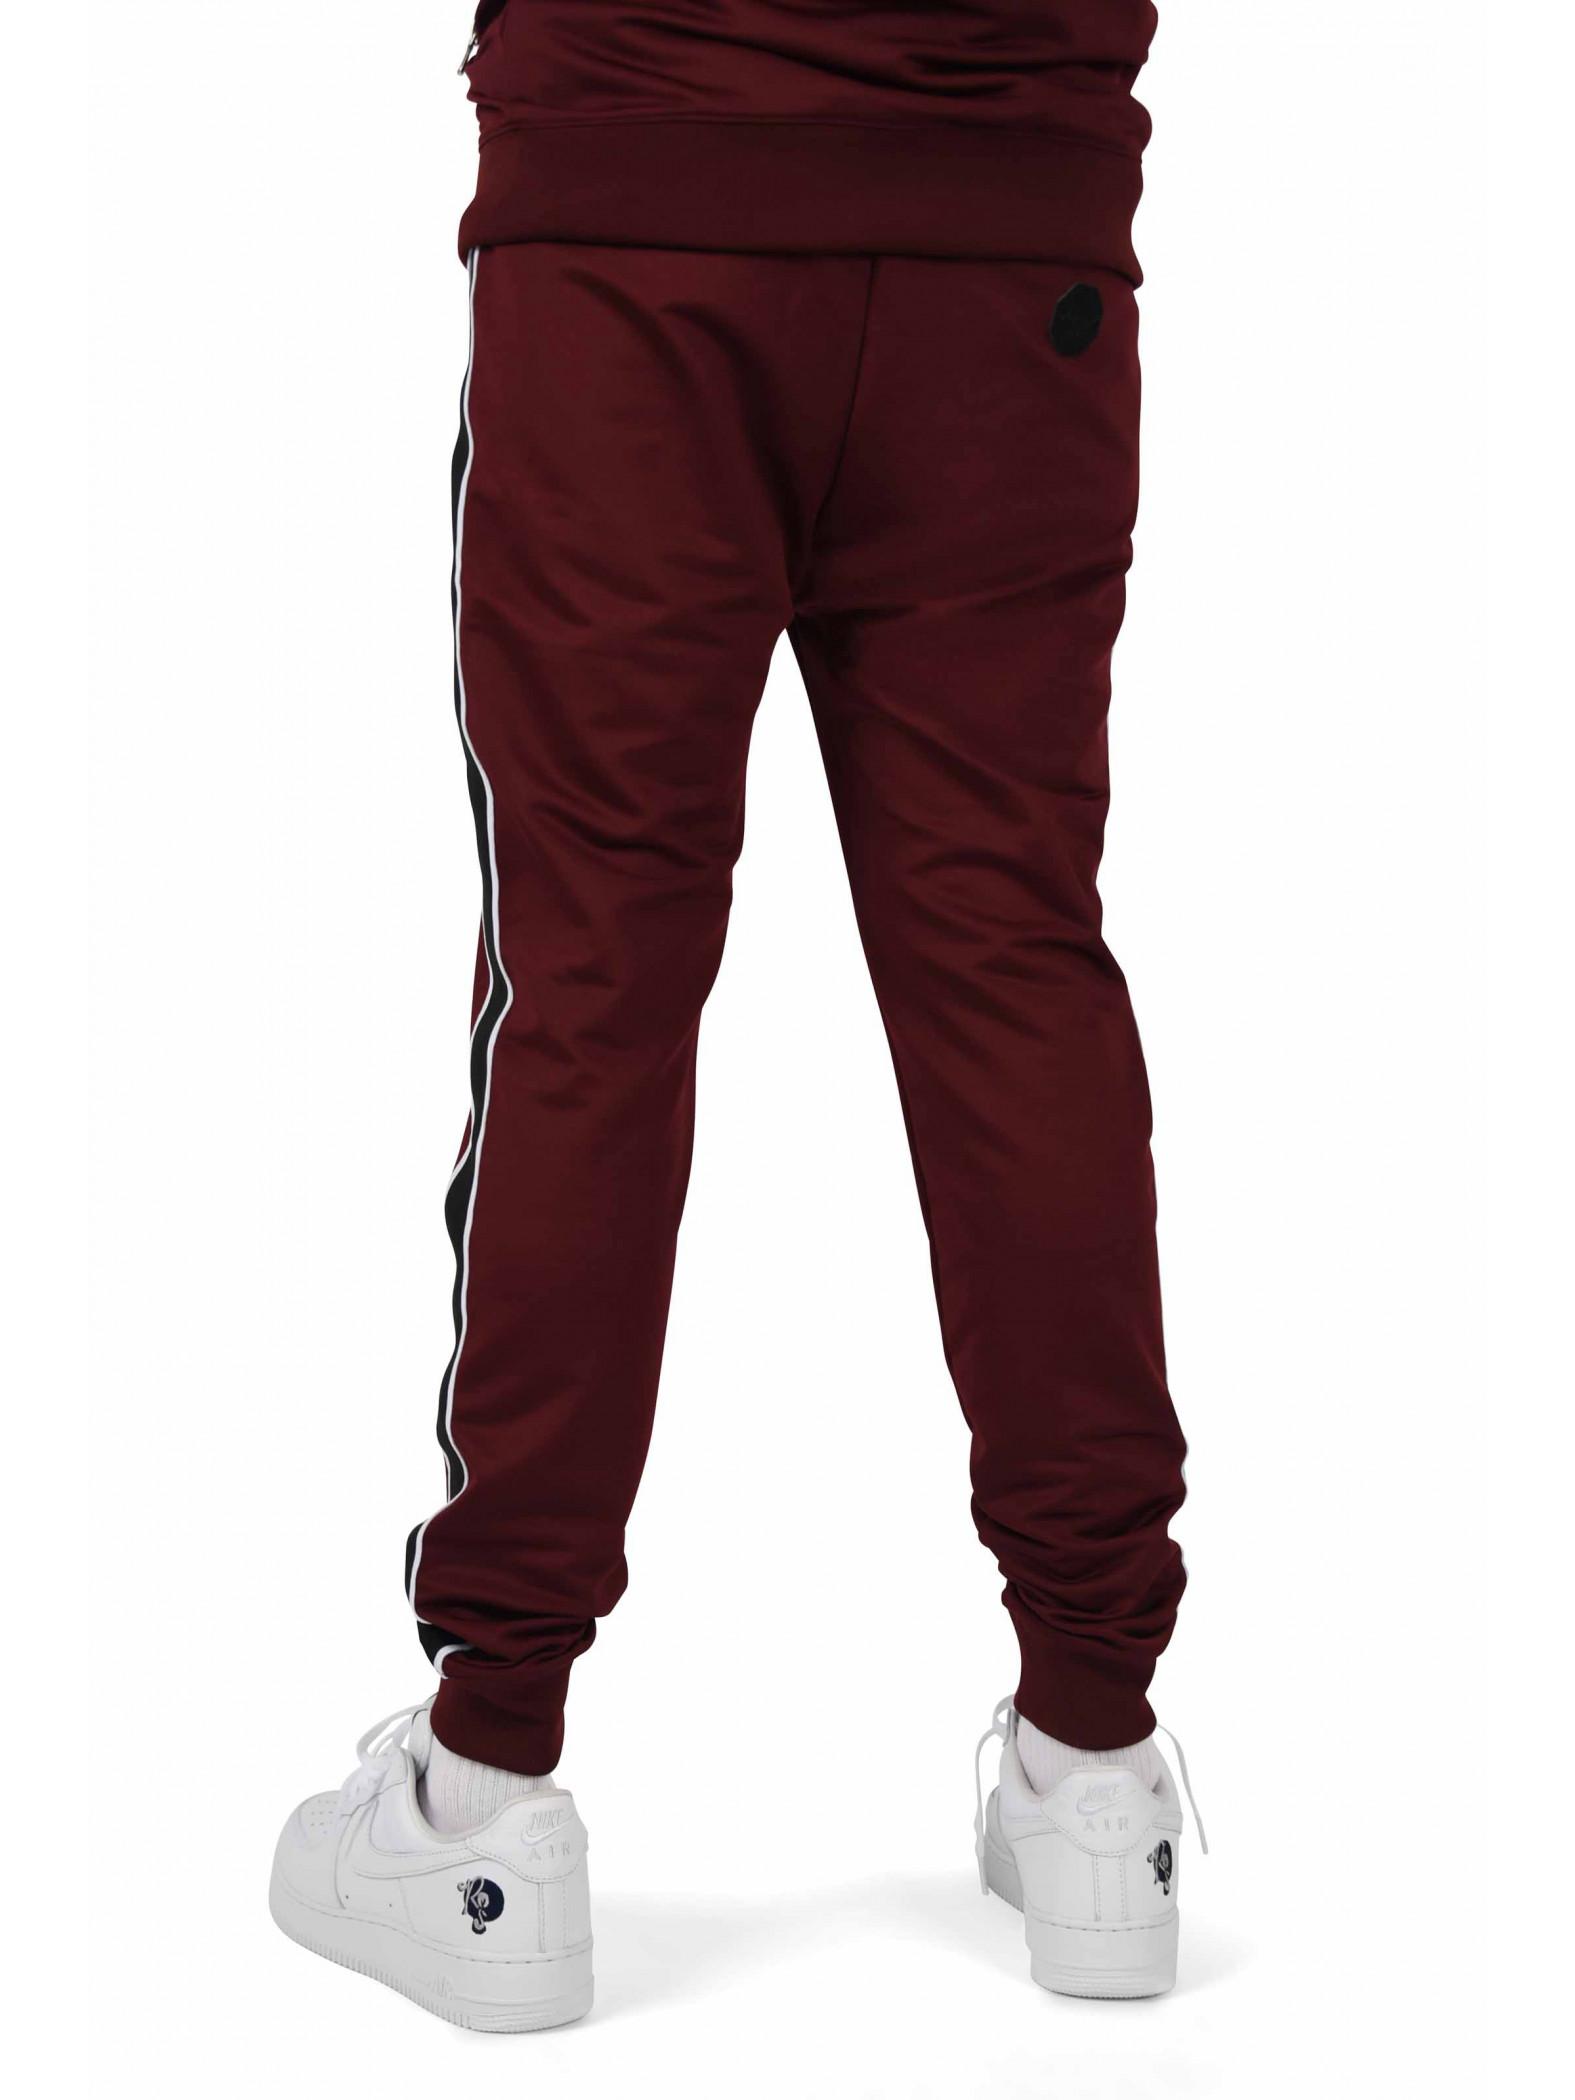 Pantalon de jogging bandes latérales bicolores contrastantes